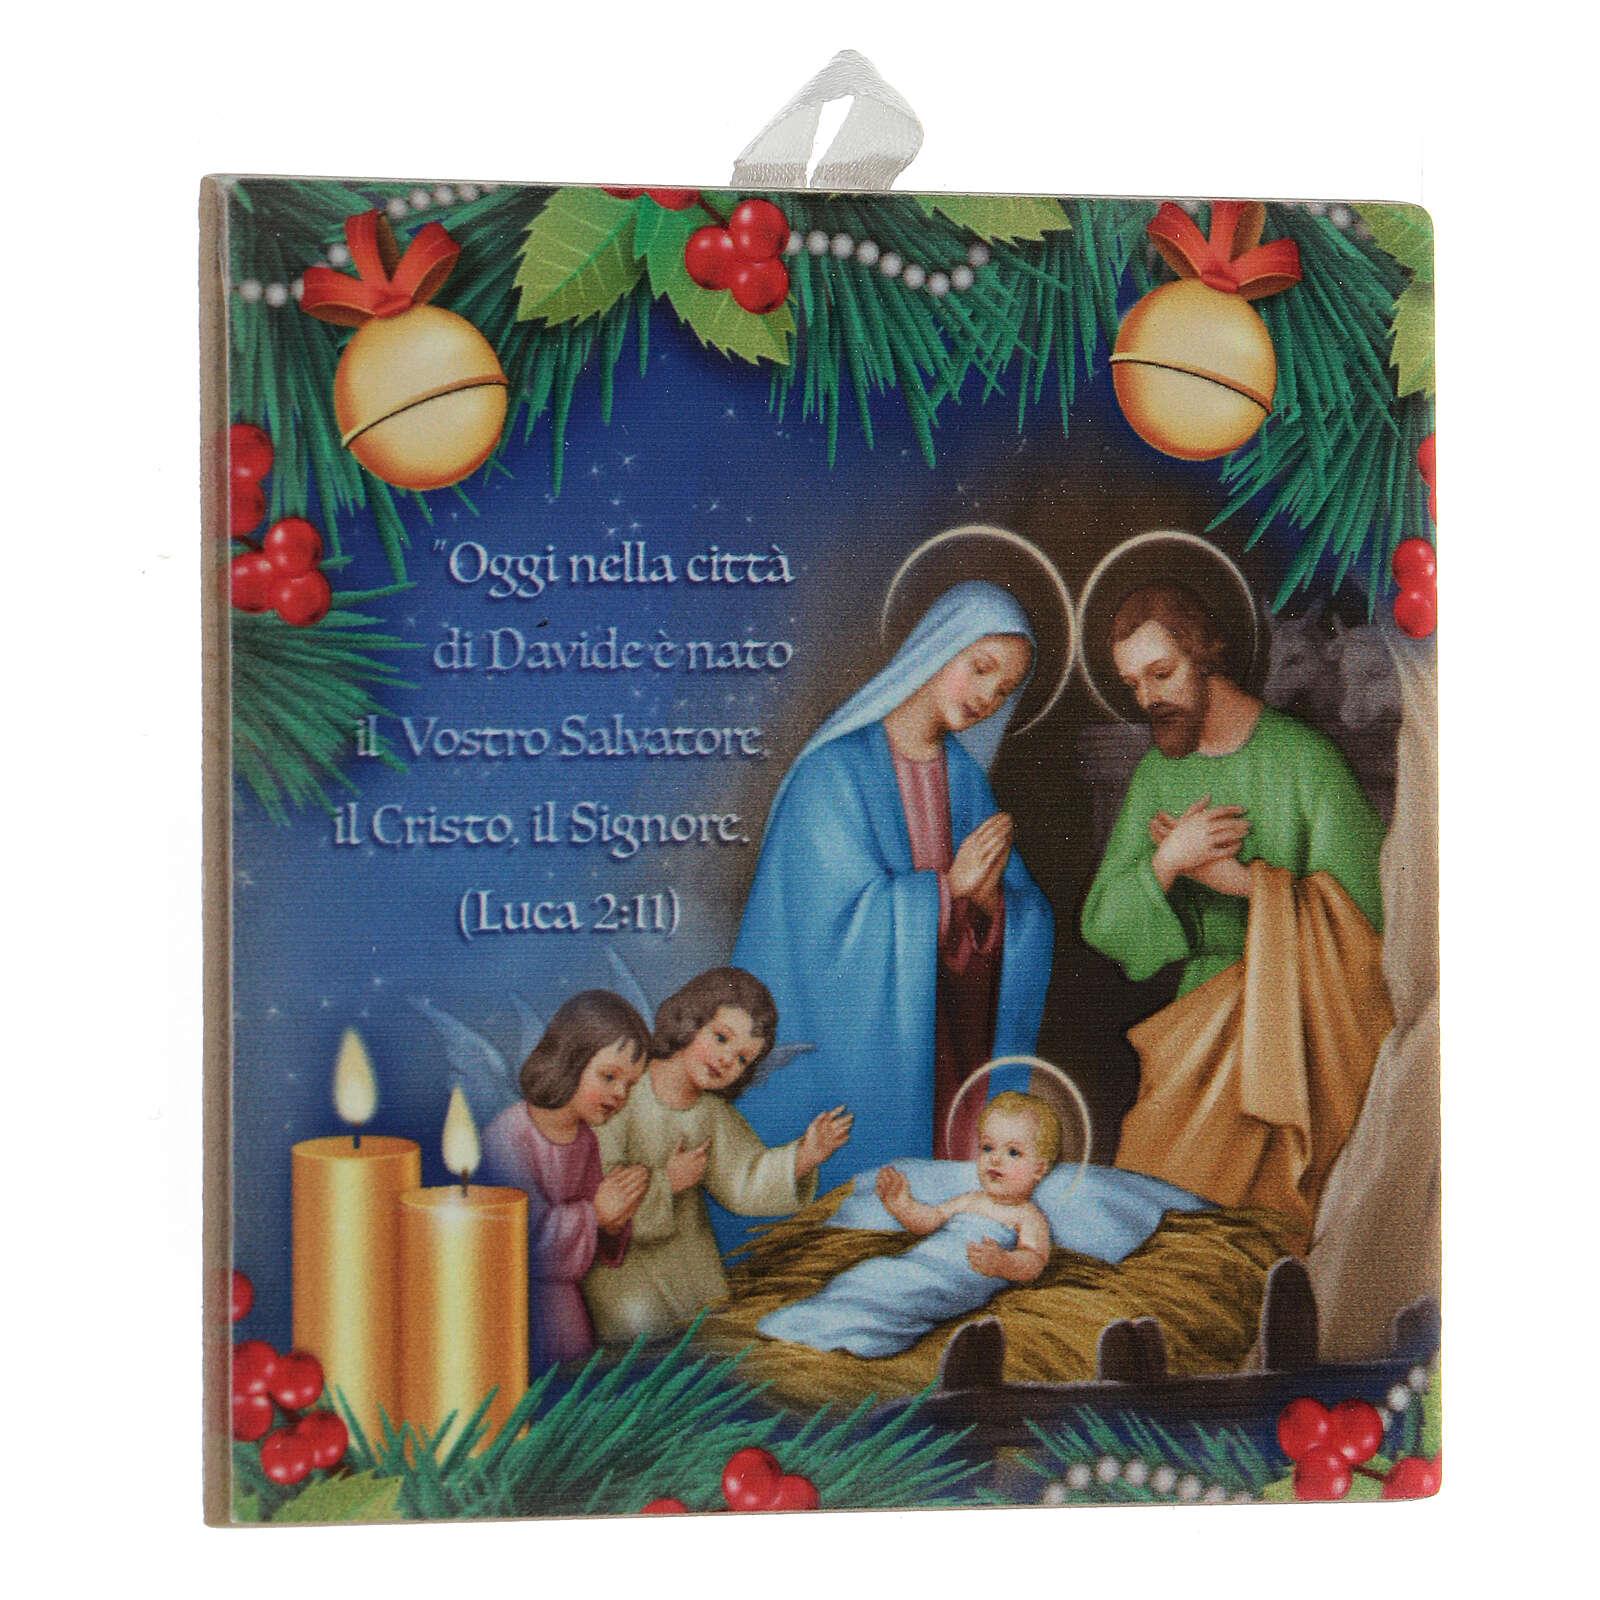 Nativity scene Christmas tile with prayer 3